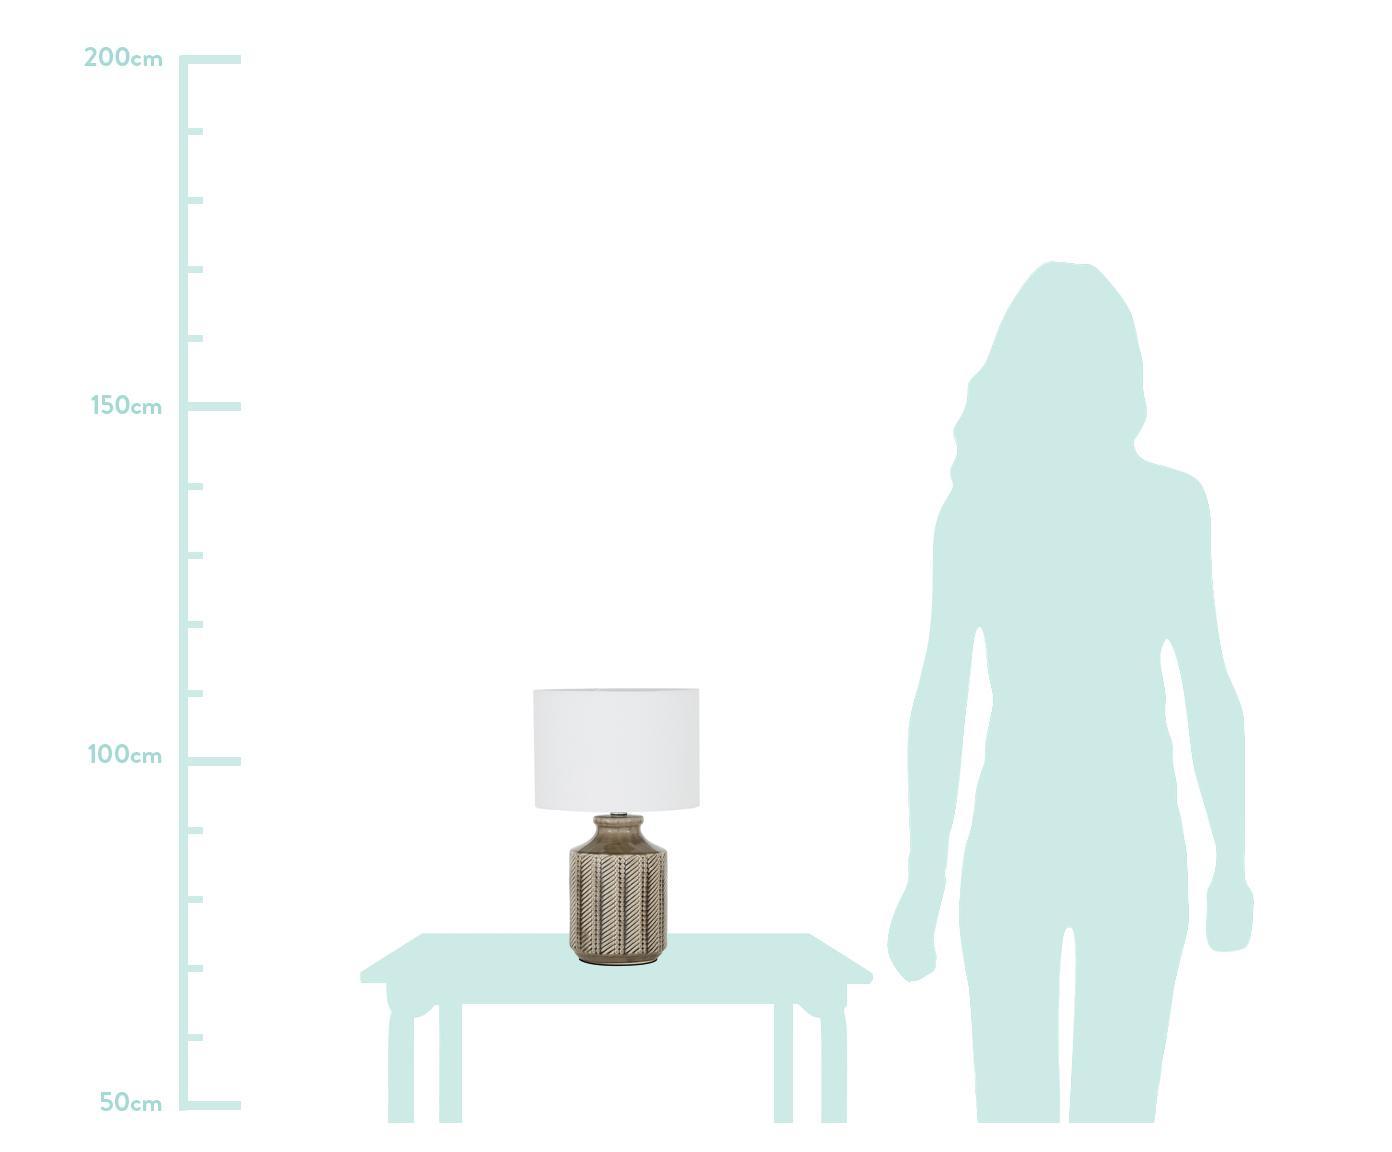 Keramik-Tischlampe Nia, Lampenschirm: Textil, Lampenfuß: Keramik, Metall, vernicke, Lampenschirm: WeißLampenfuß: Braun, Nickel, Ø 26 x H 43 cm